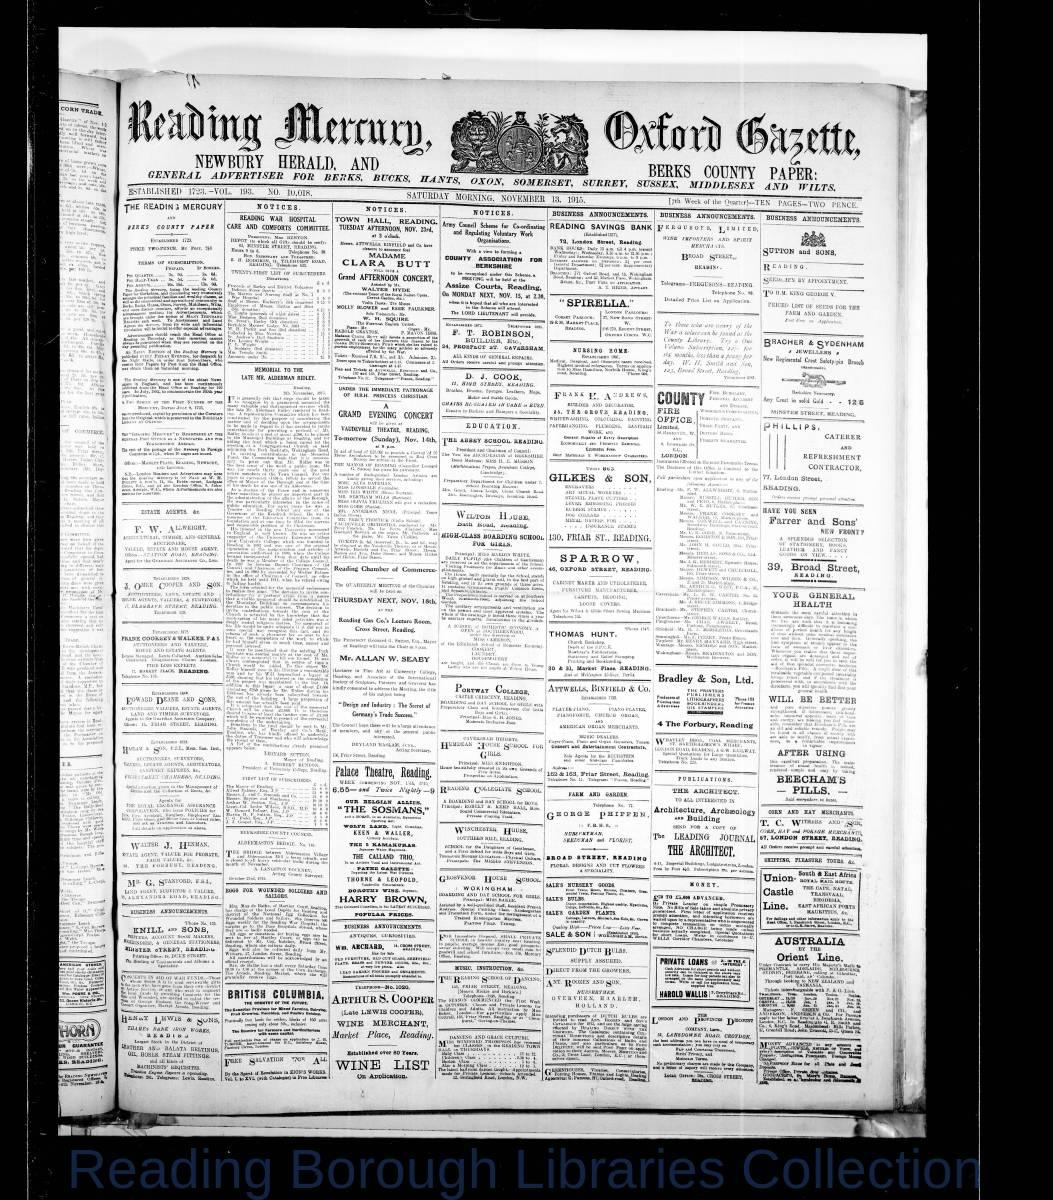 Reading Mercury Oxford Gazette Saturday, November 13, 1915. Pg 1